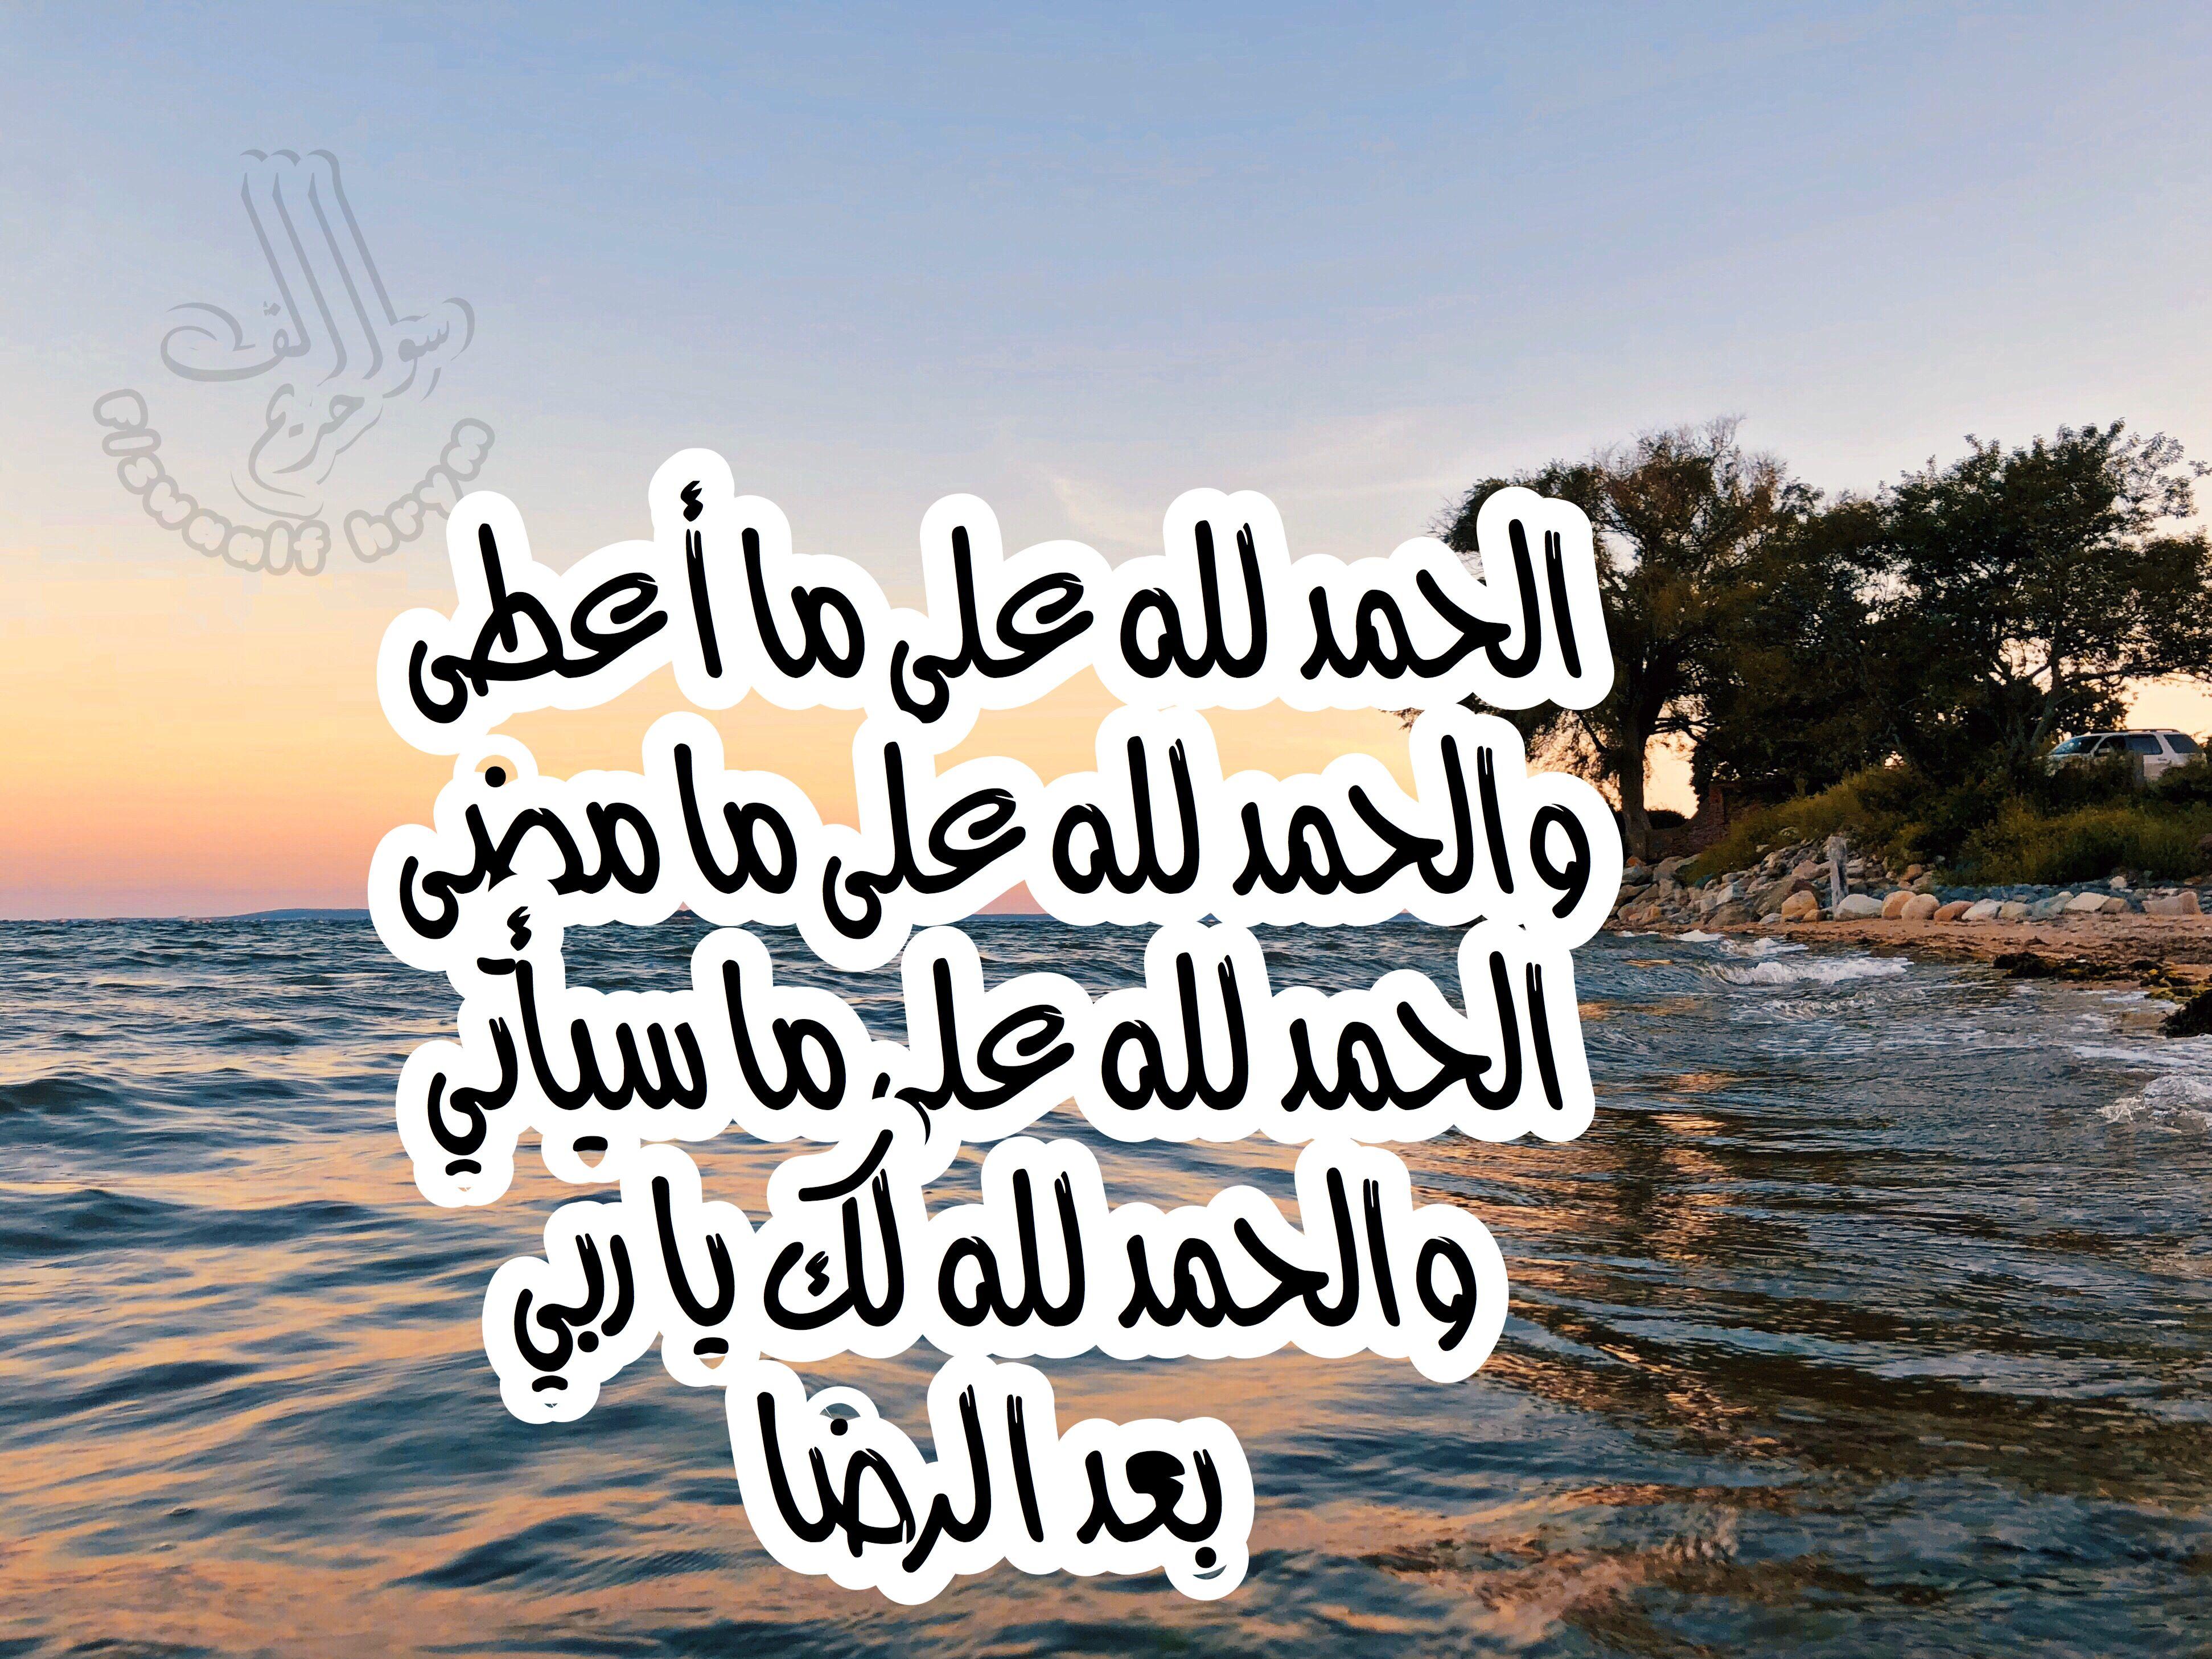 Pin By صور معبرة On يارب Arabic Calligraphy Calligraphy